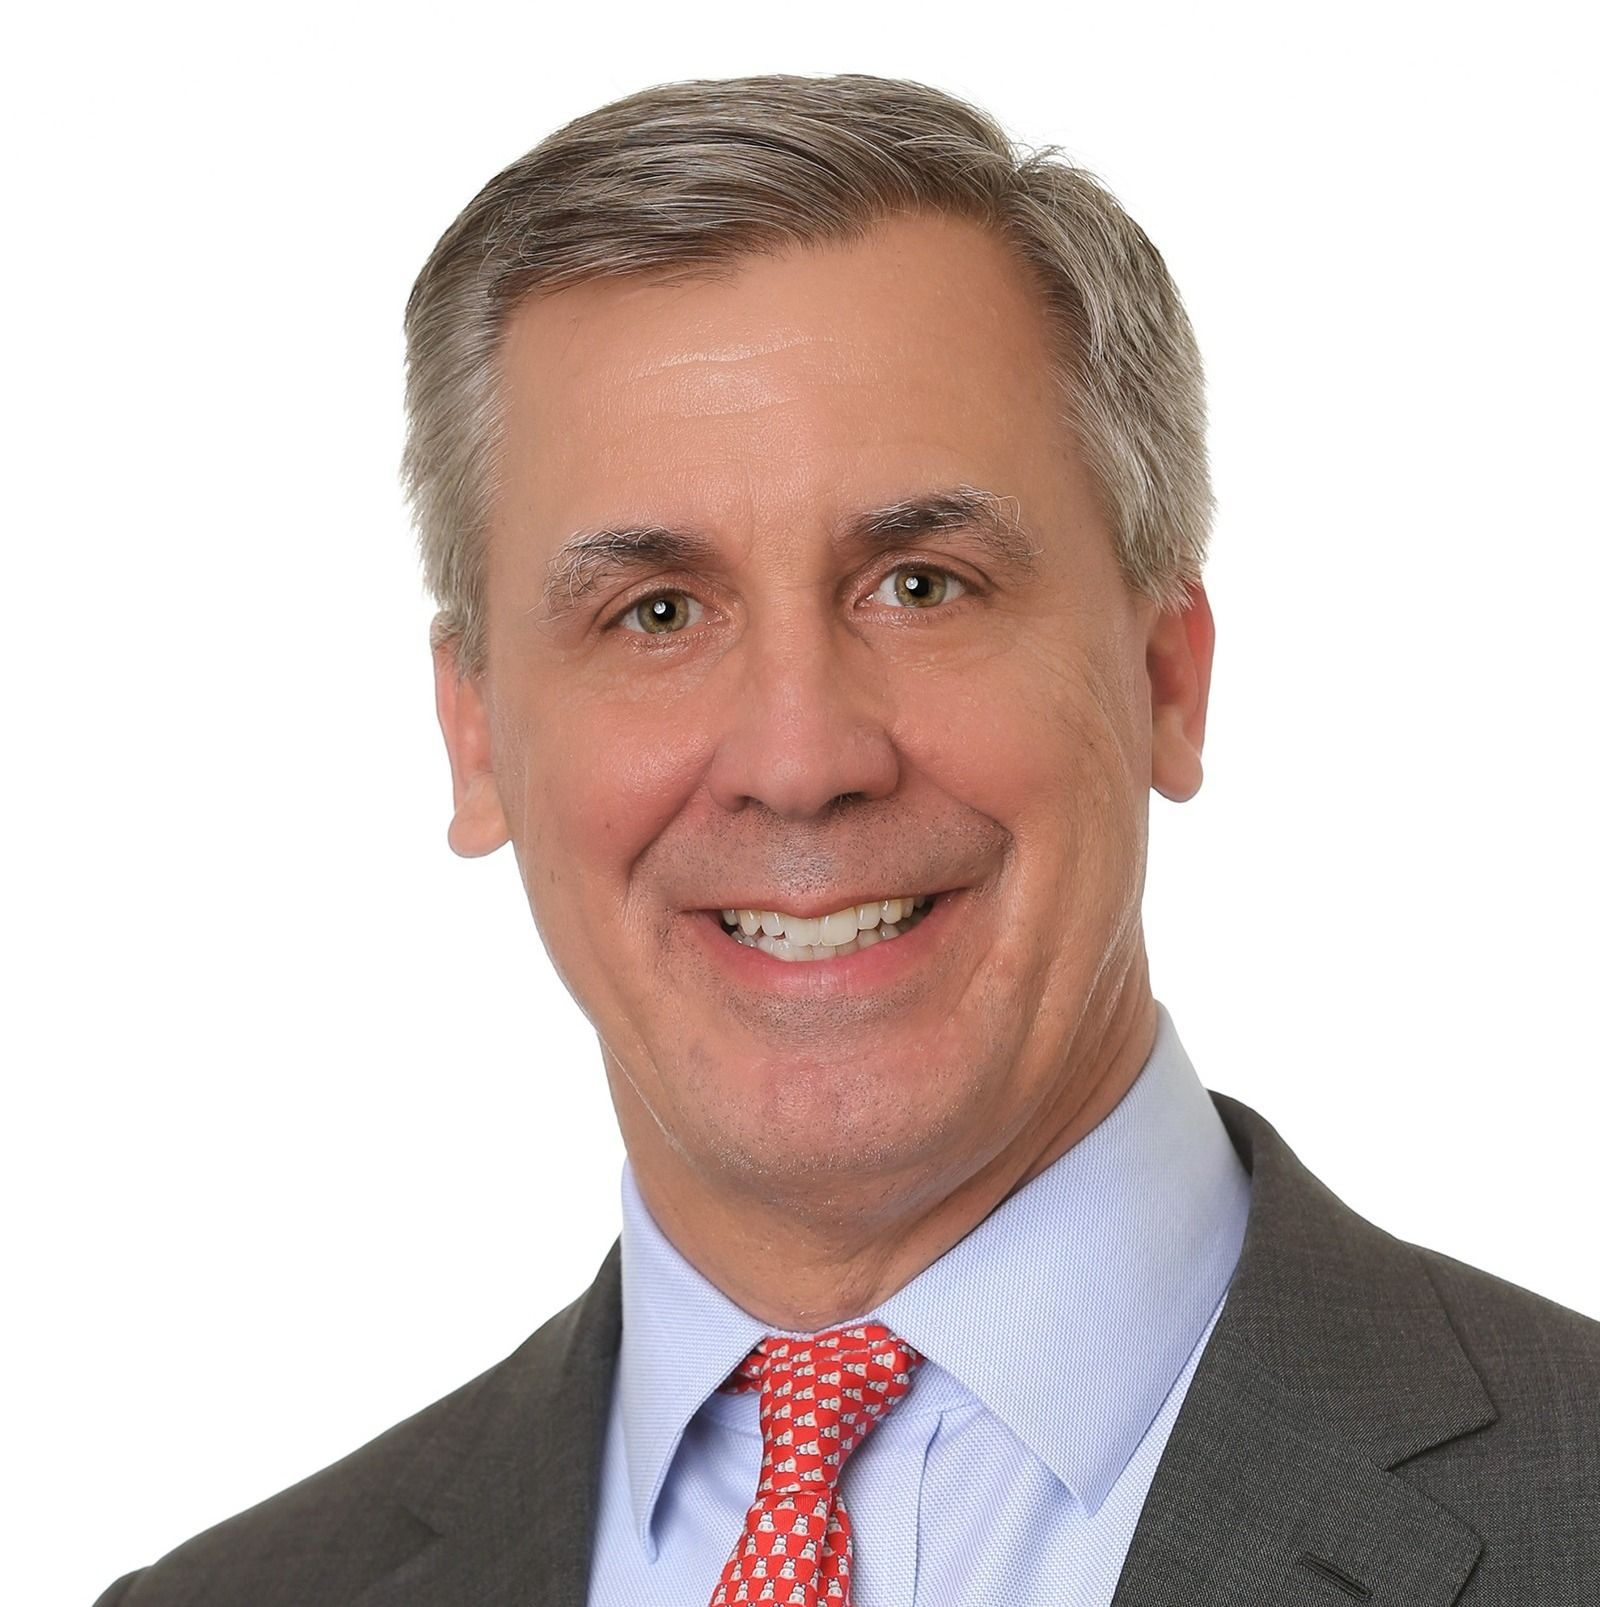 Chris McComish